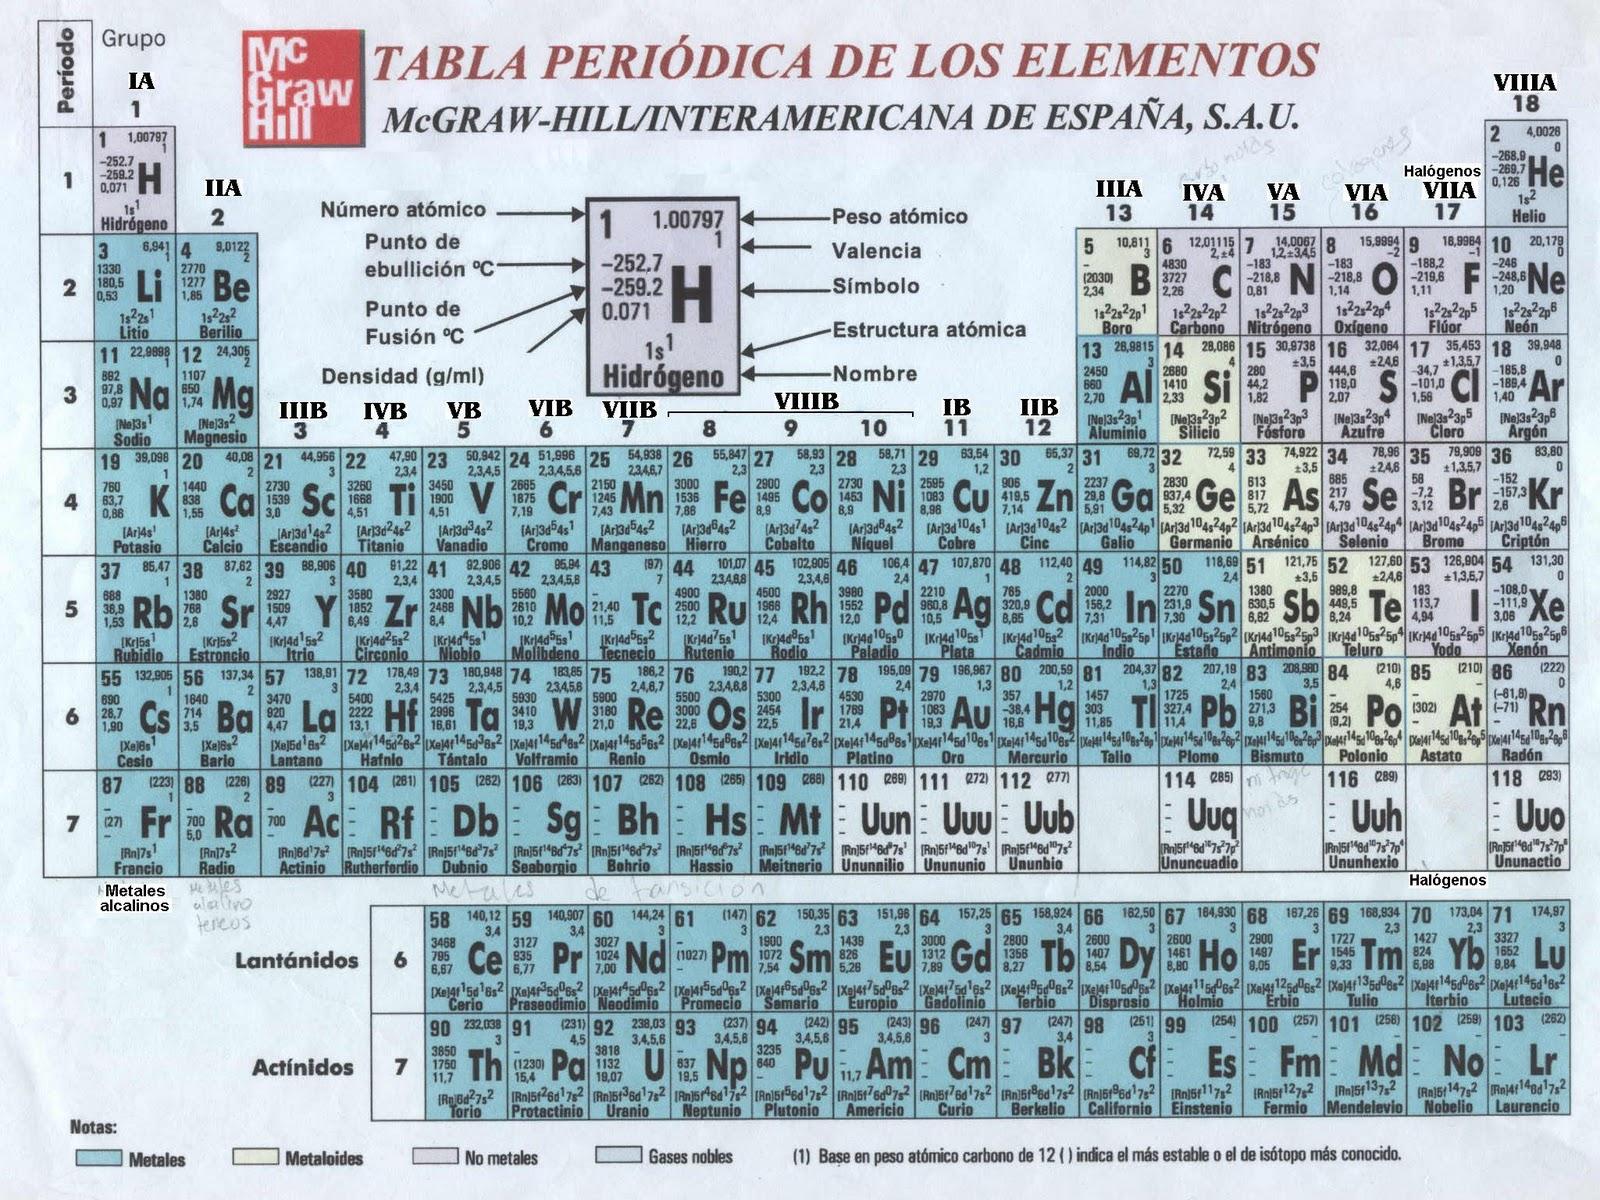 Fisico quimica tabla periodica y sus elementos fisico quimica urtaz Gallery